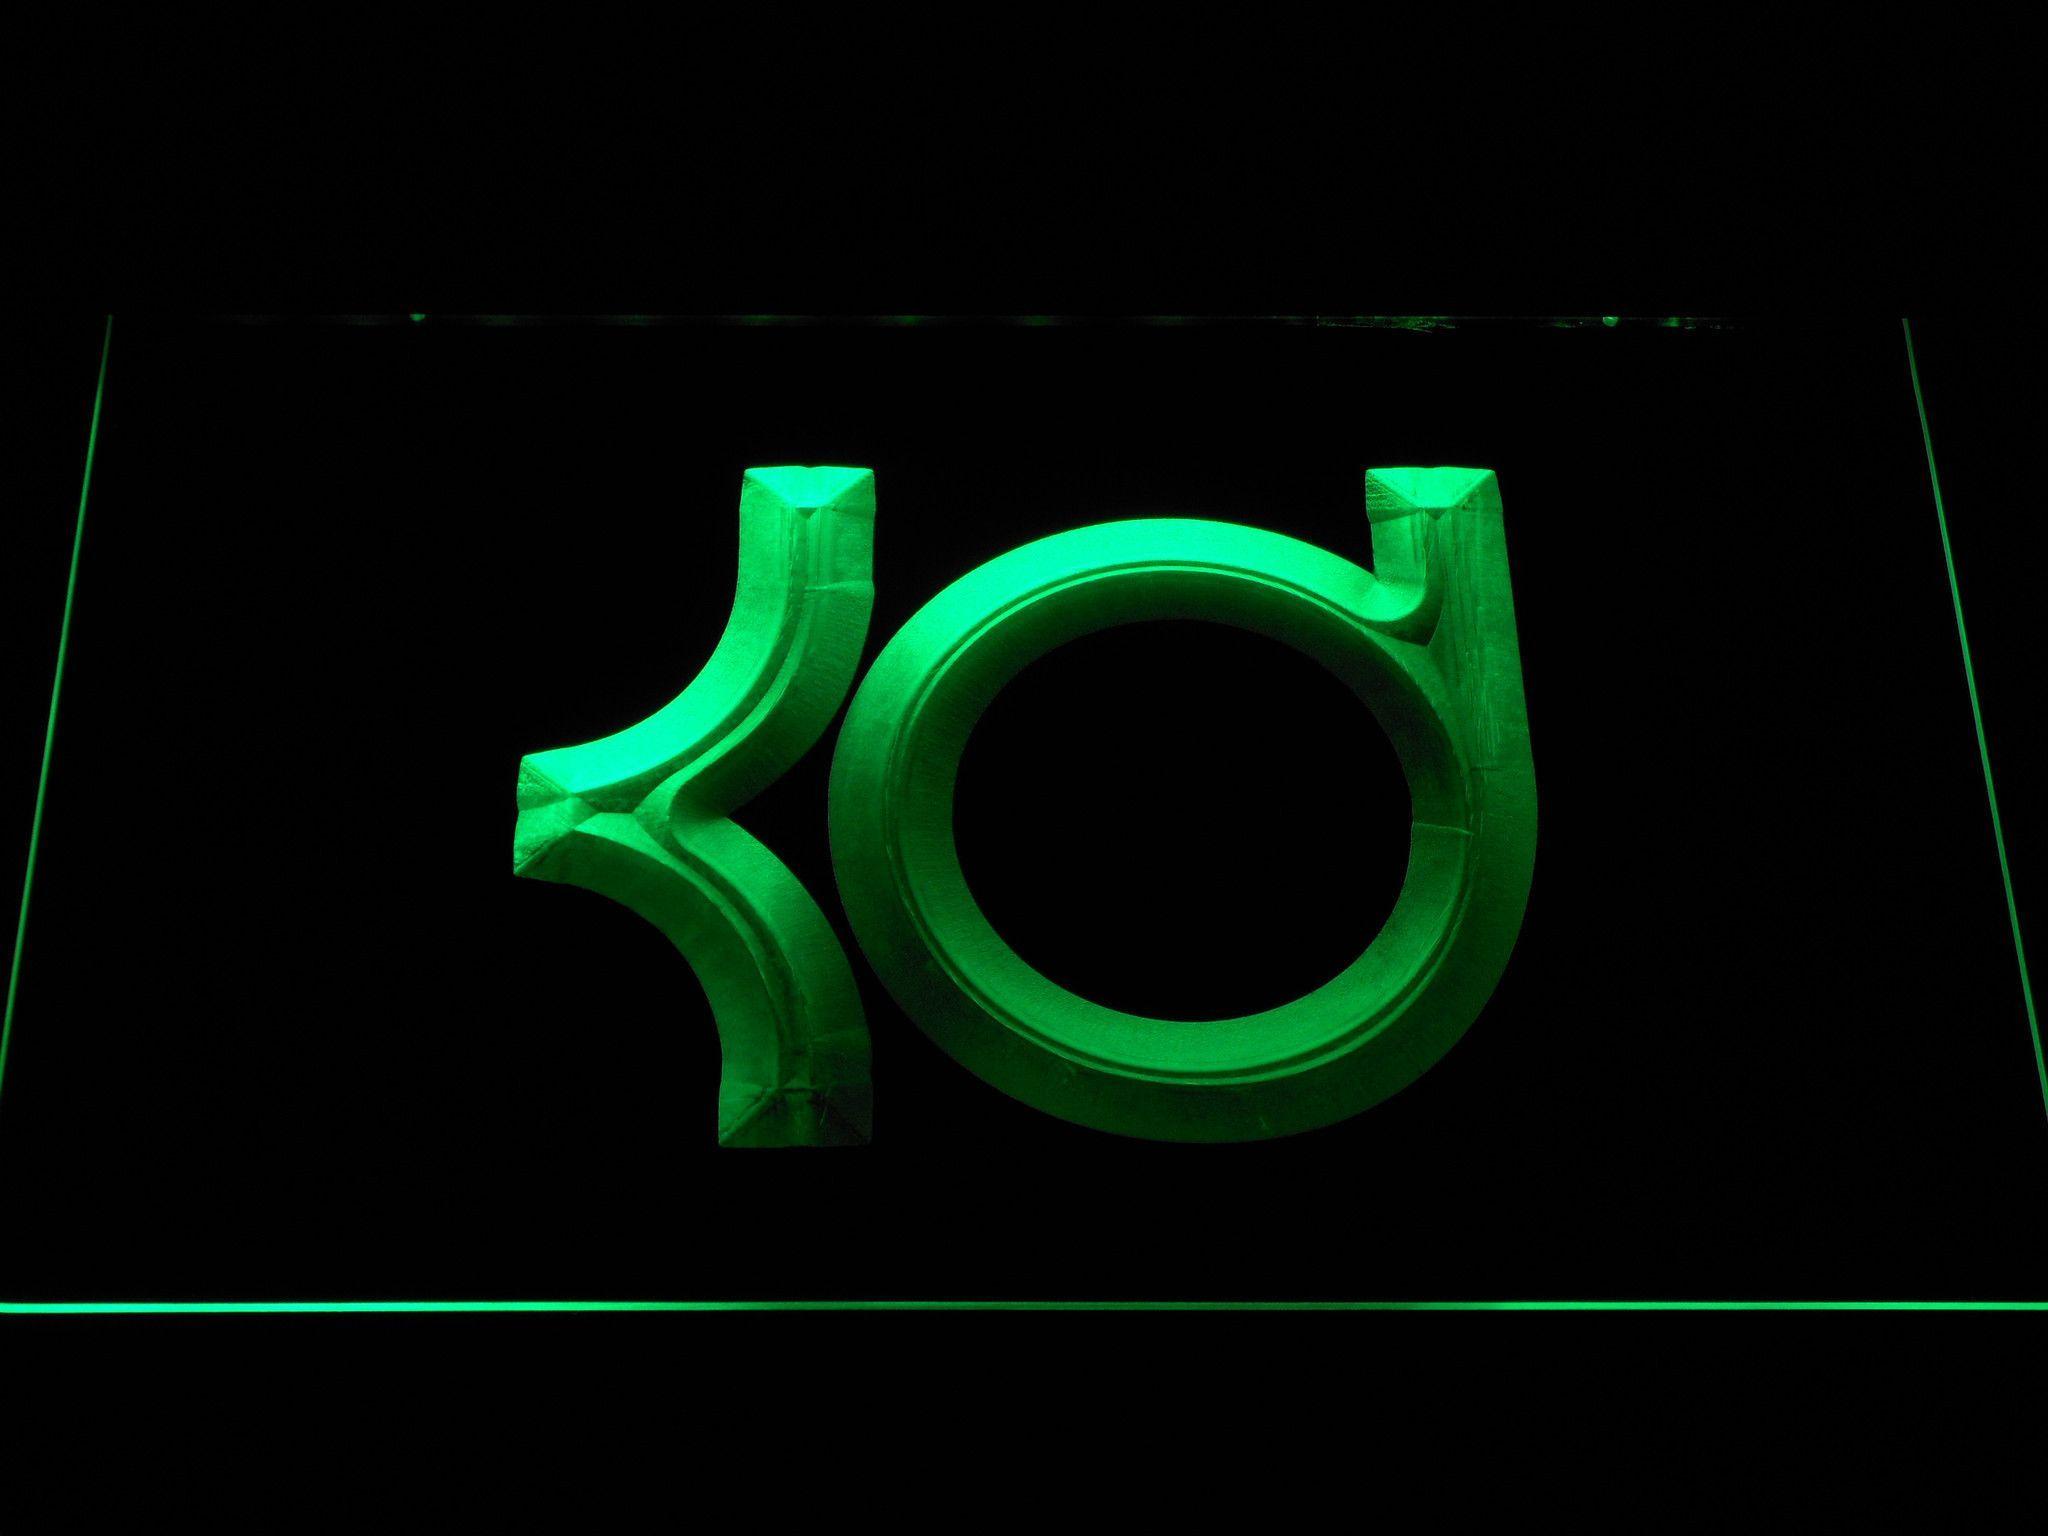 Golden State Warriors Kevin Durant Logo Led Neon Sign Neon Signs Led Neon Signs Sign Lighting